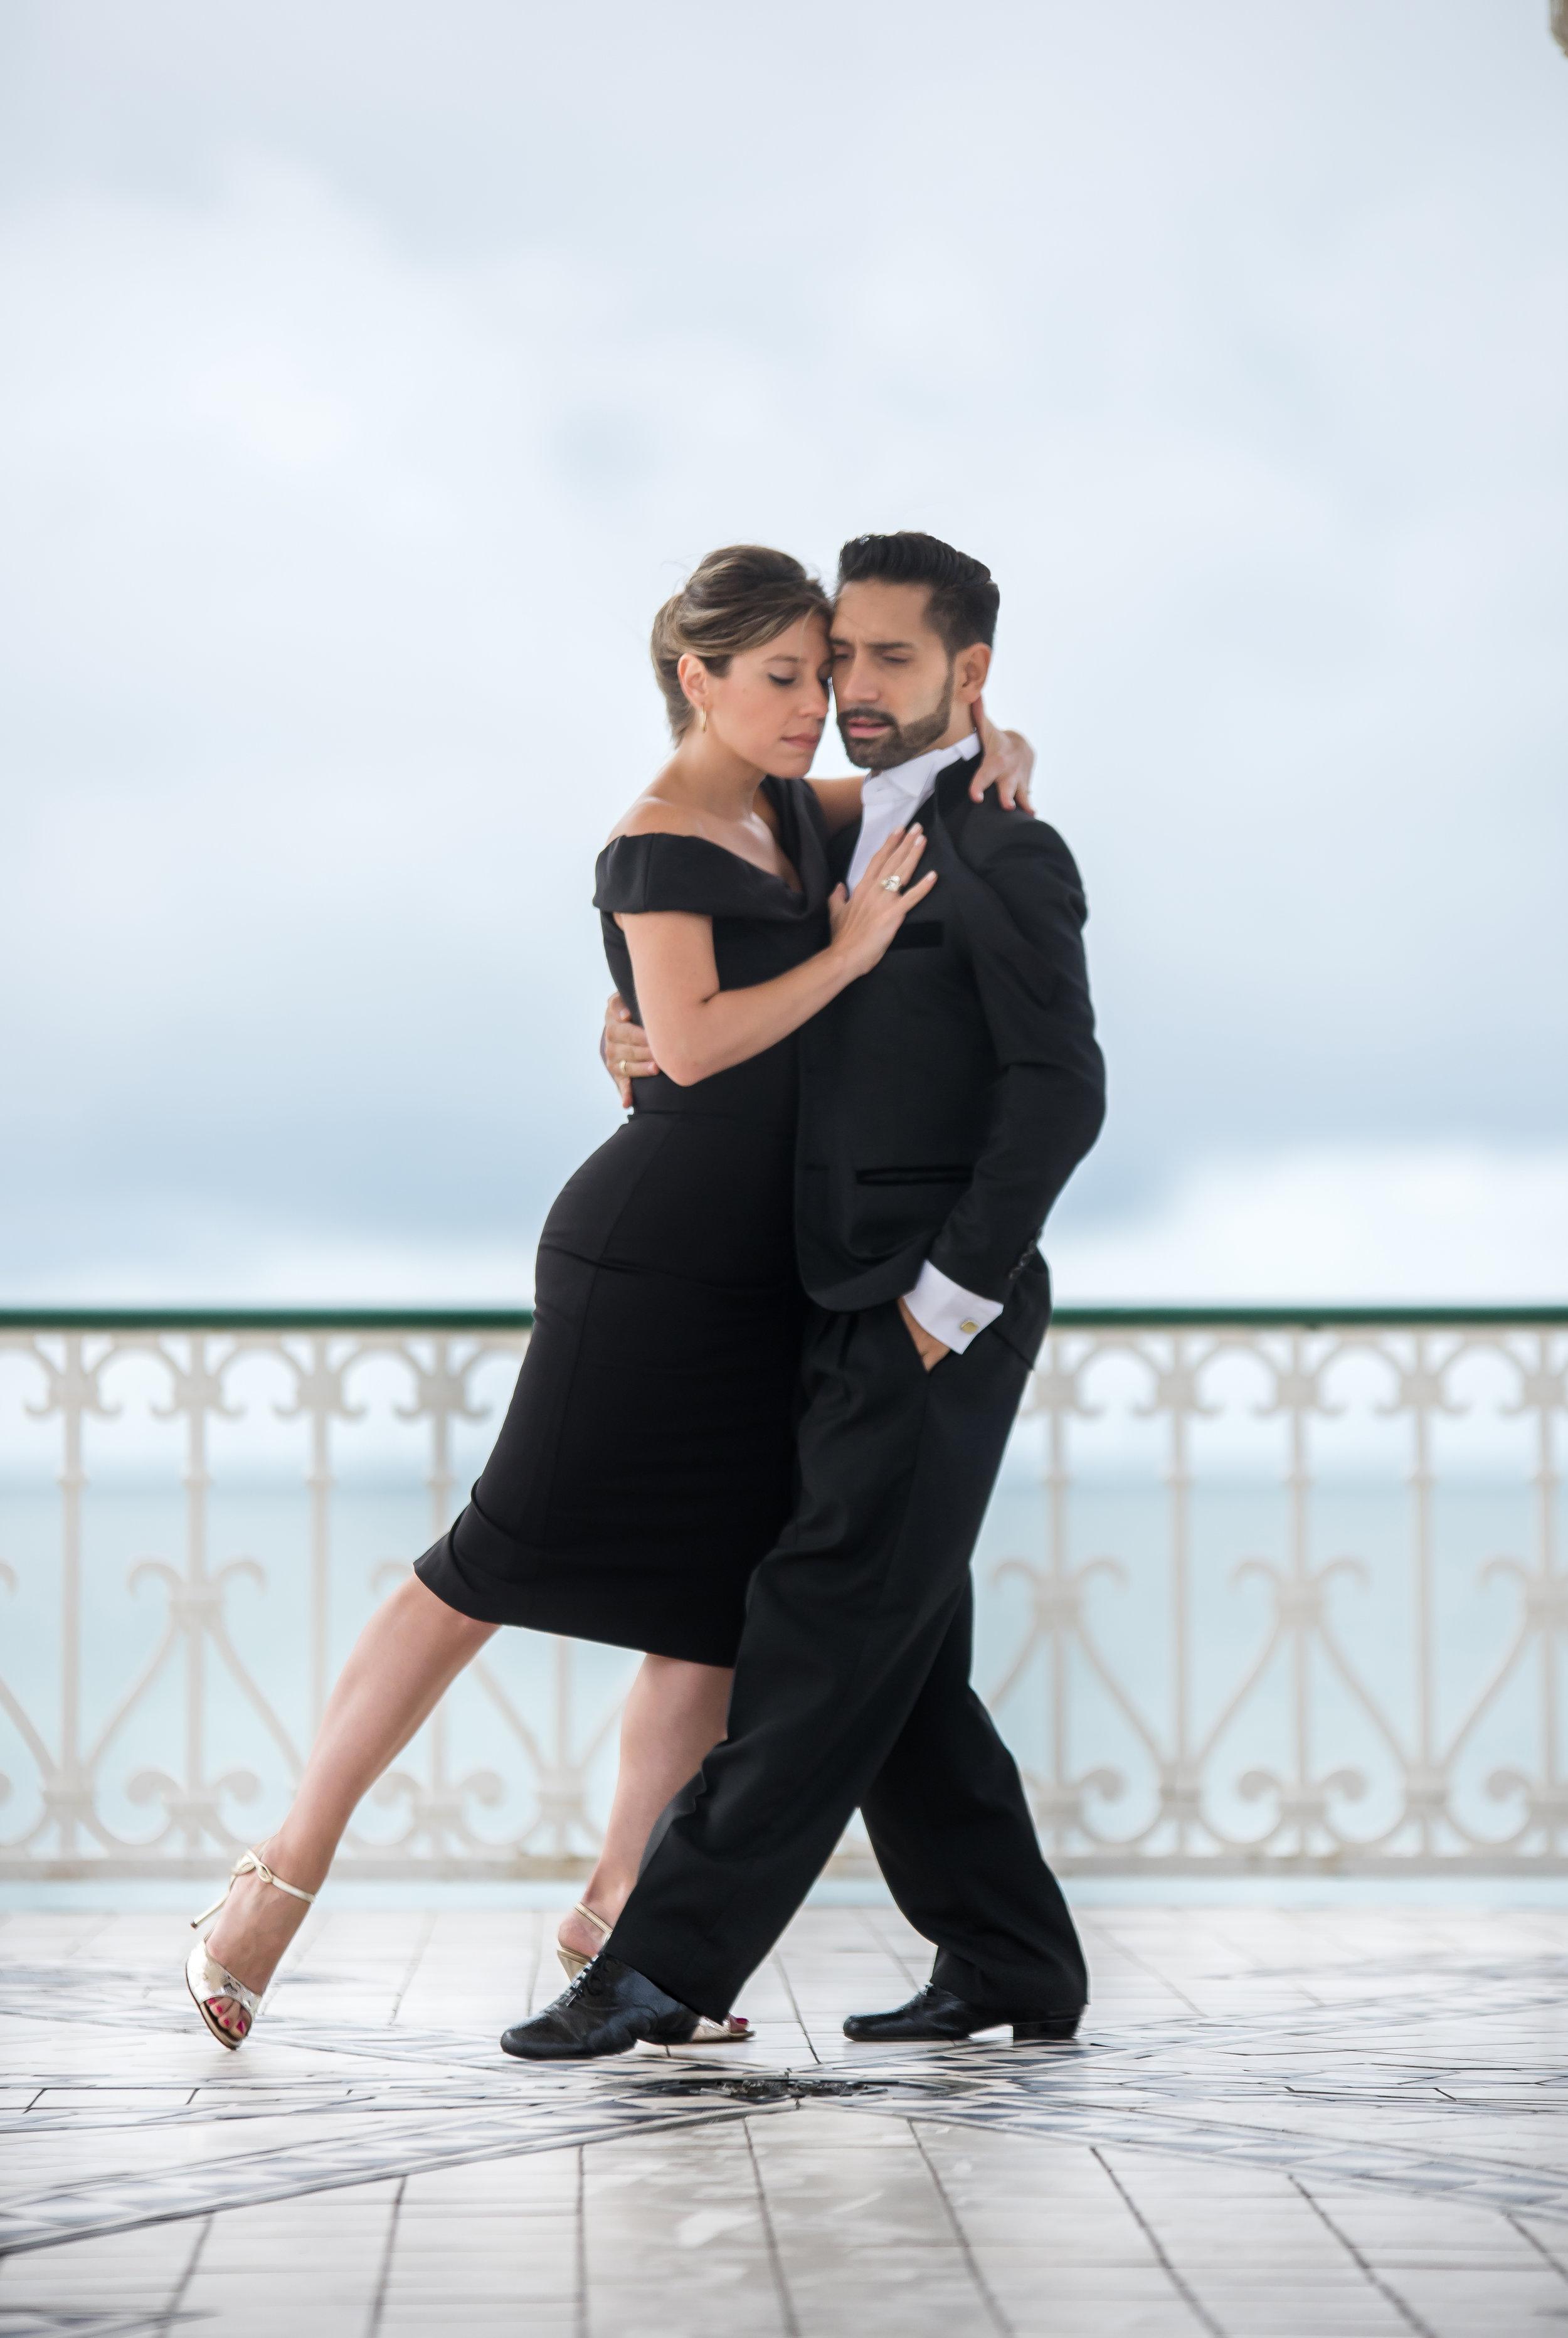 Stefania and Juan start to dance